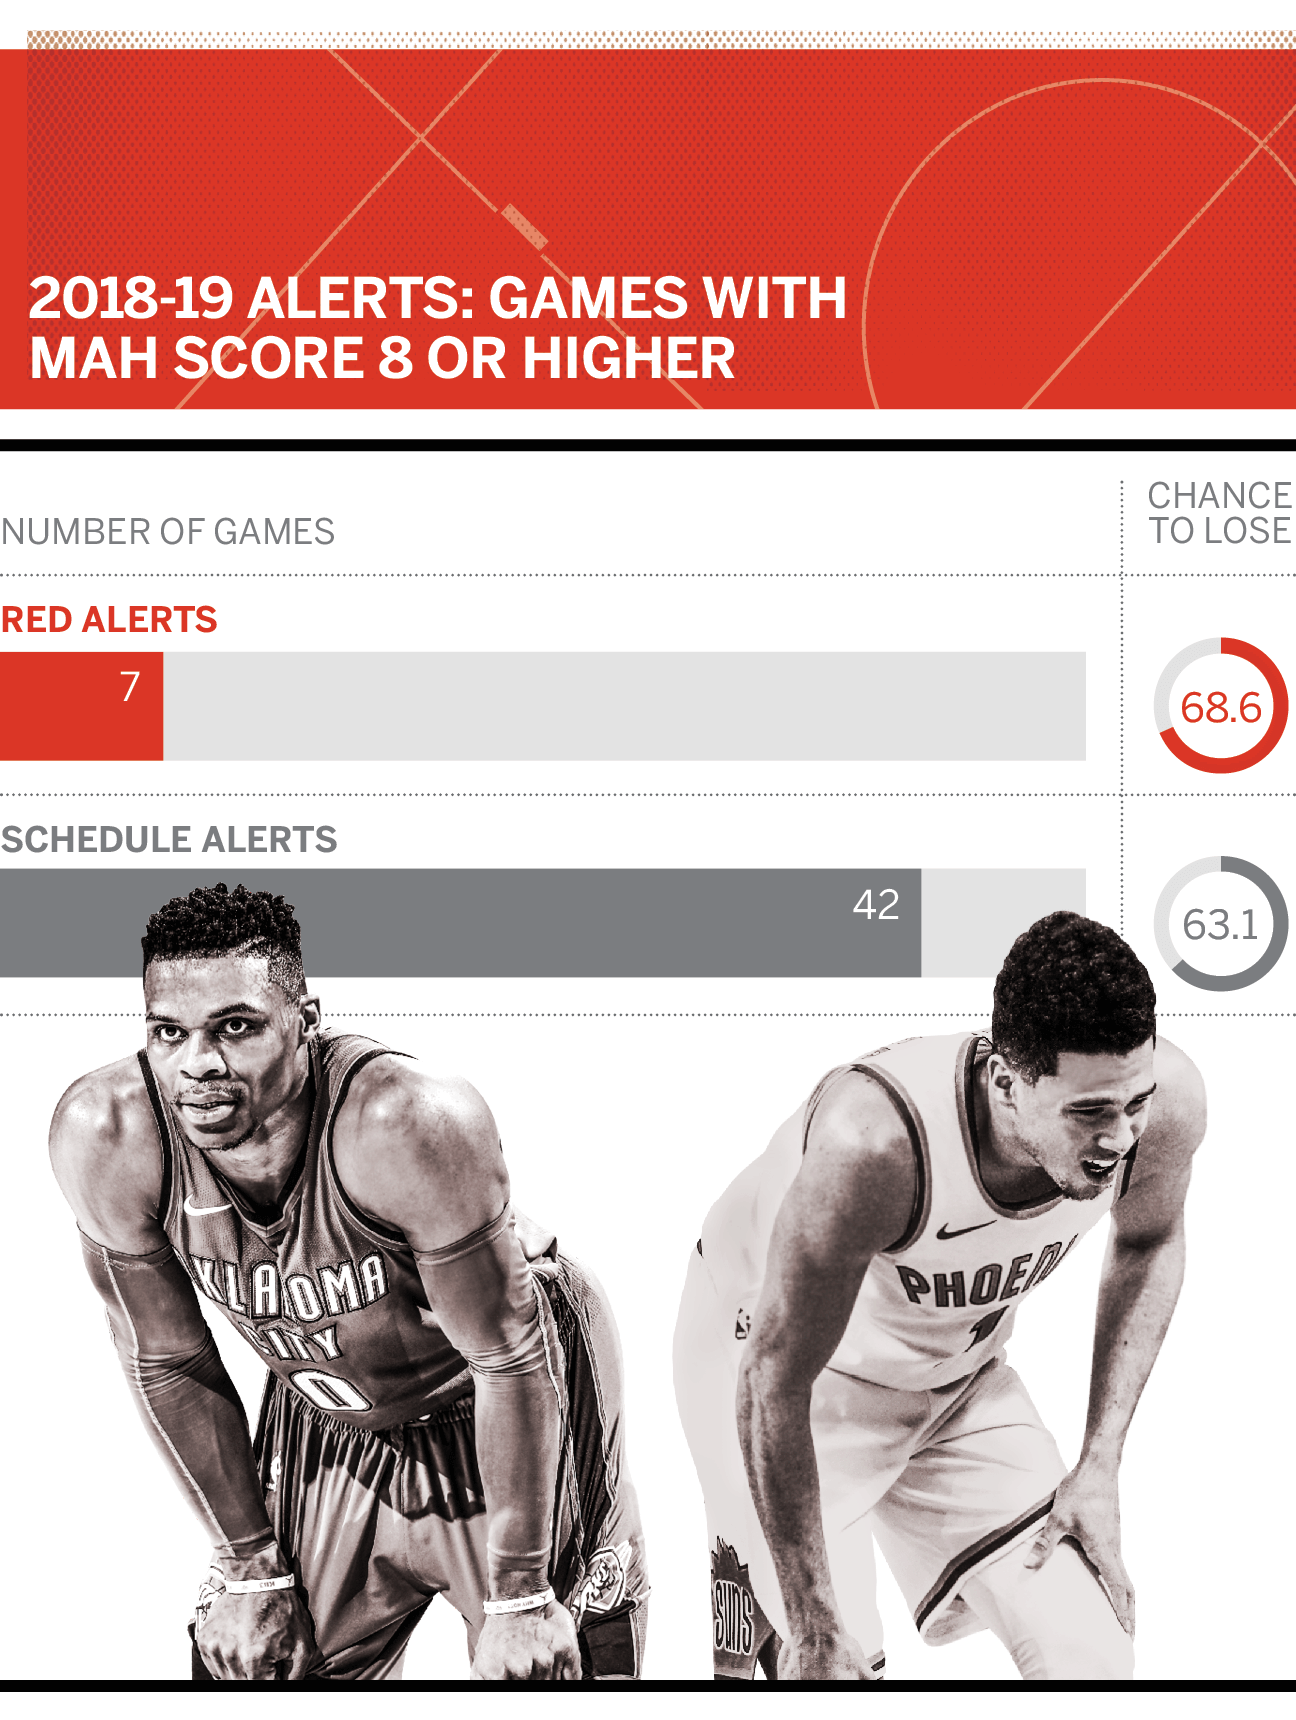 NBA Schedule Alert! Games your team will lose in 2018-19